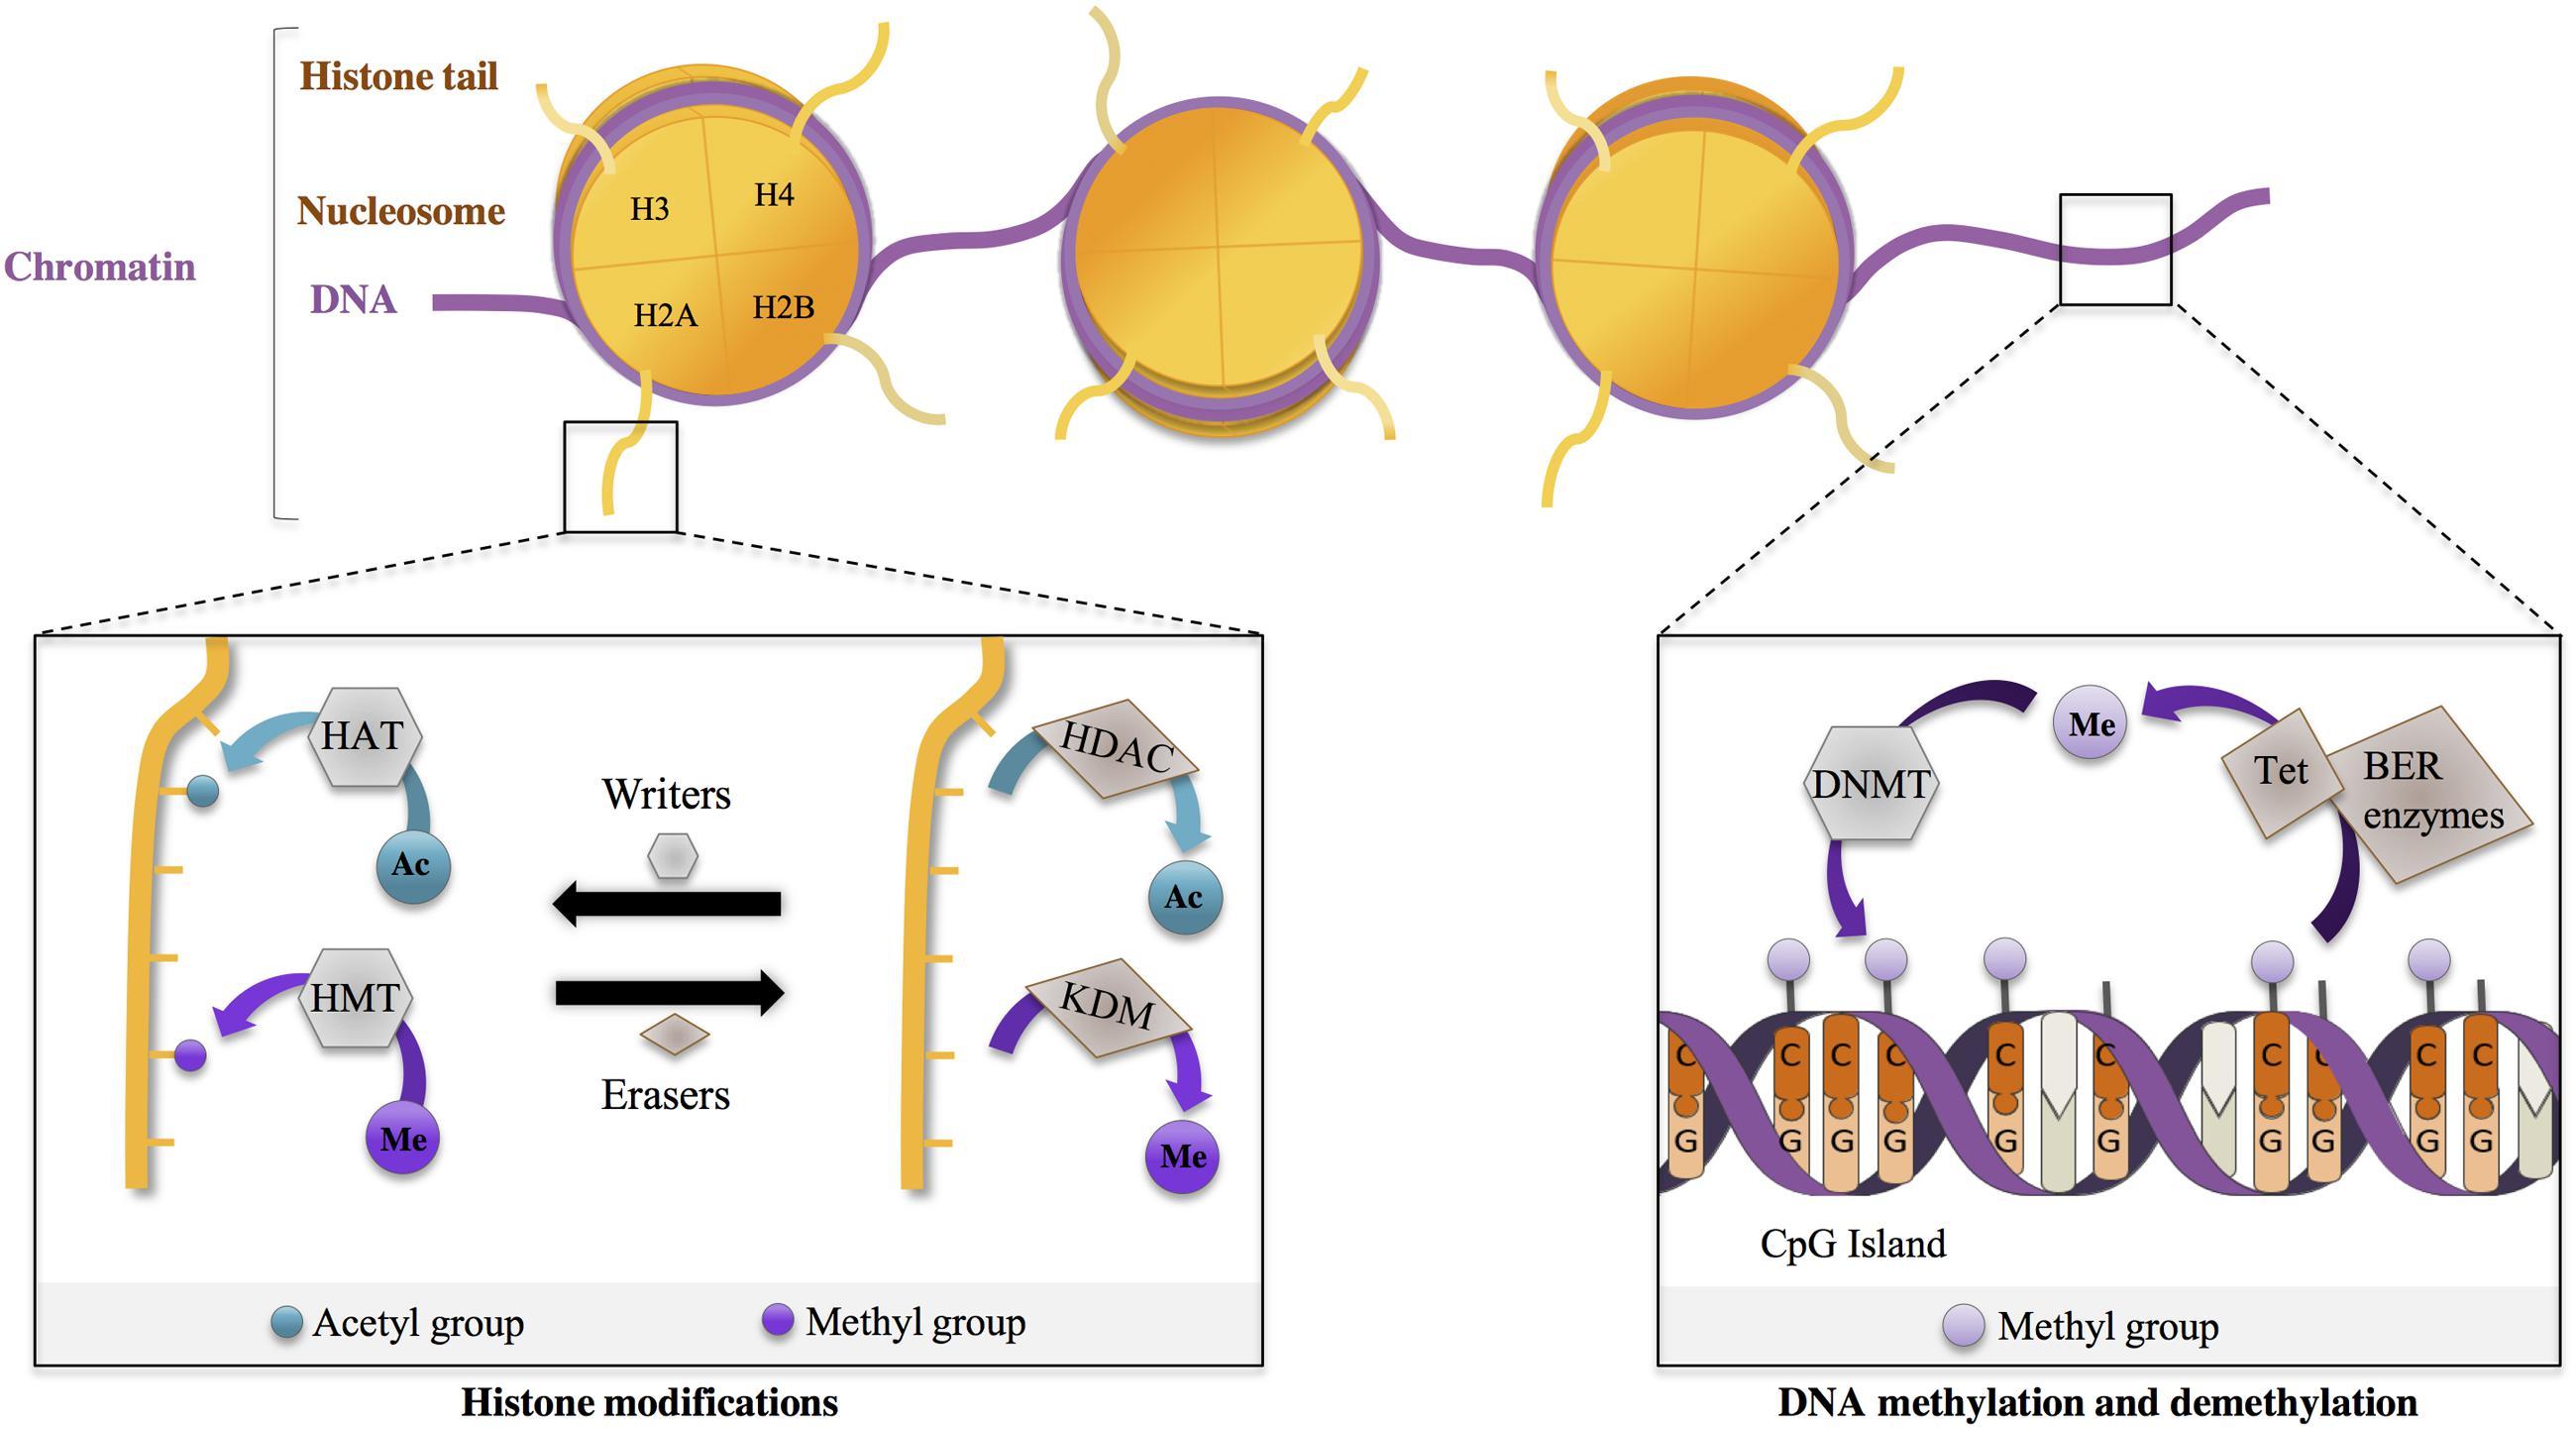 Shared Epigenetic Changes Underlie >> Frontiers Contribution Of Neuroepigenetics To Huntington S Disease